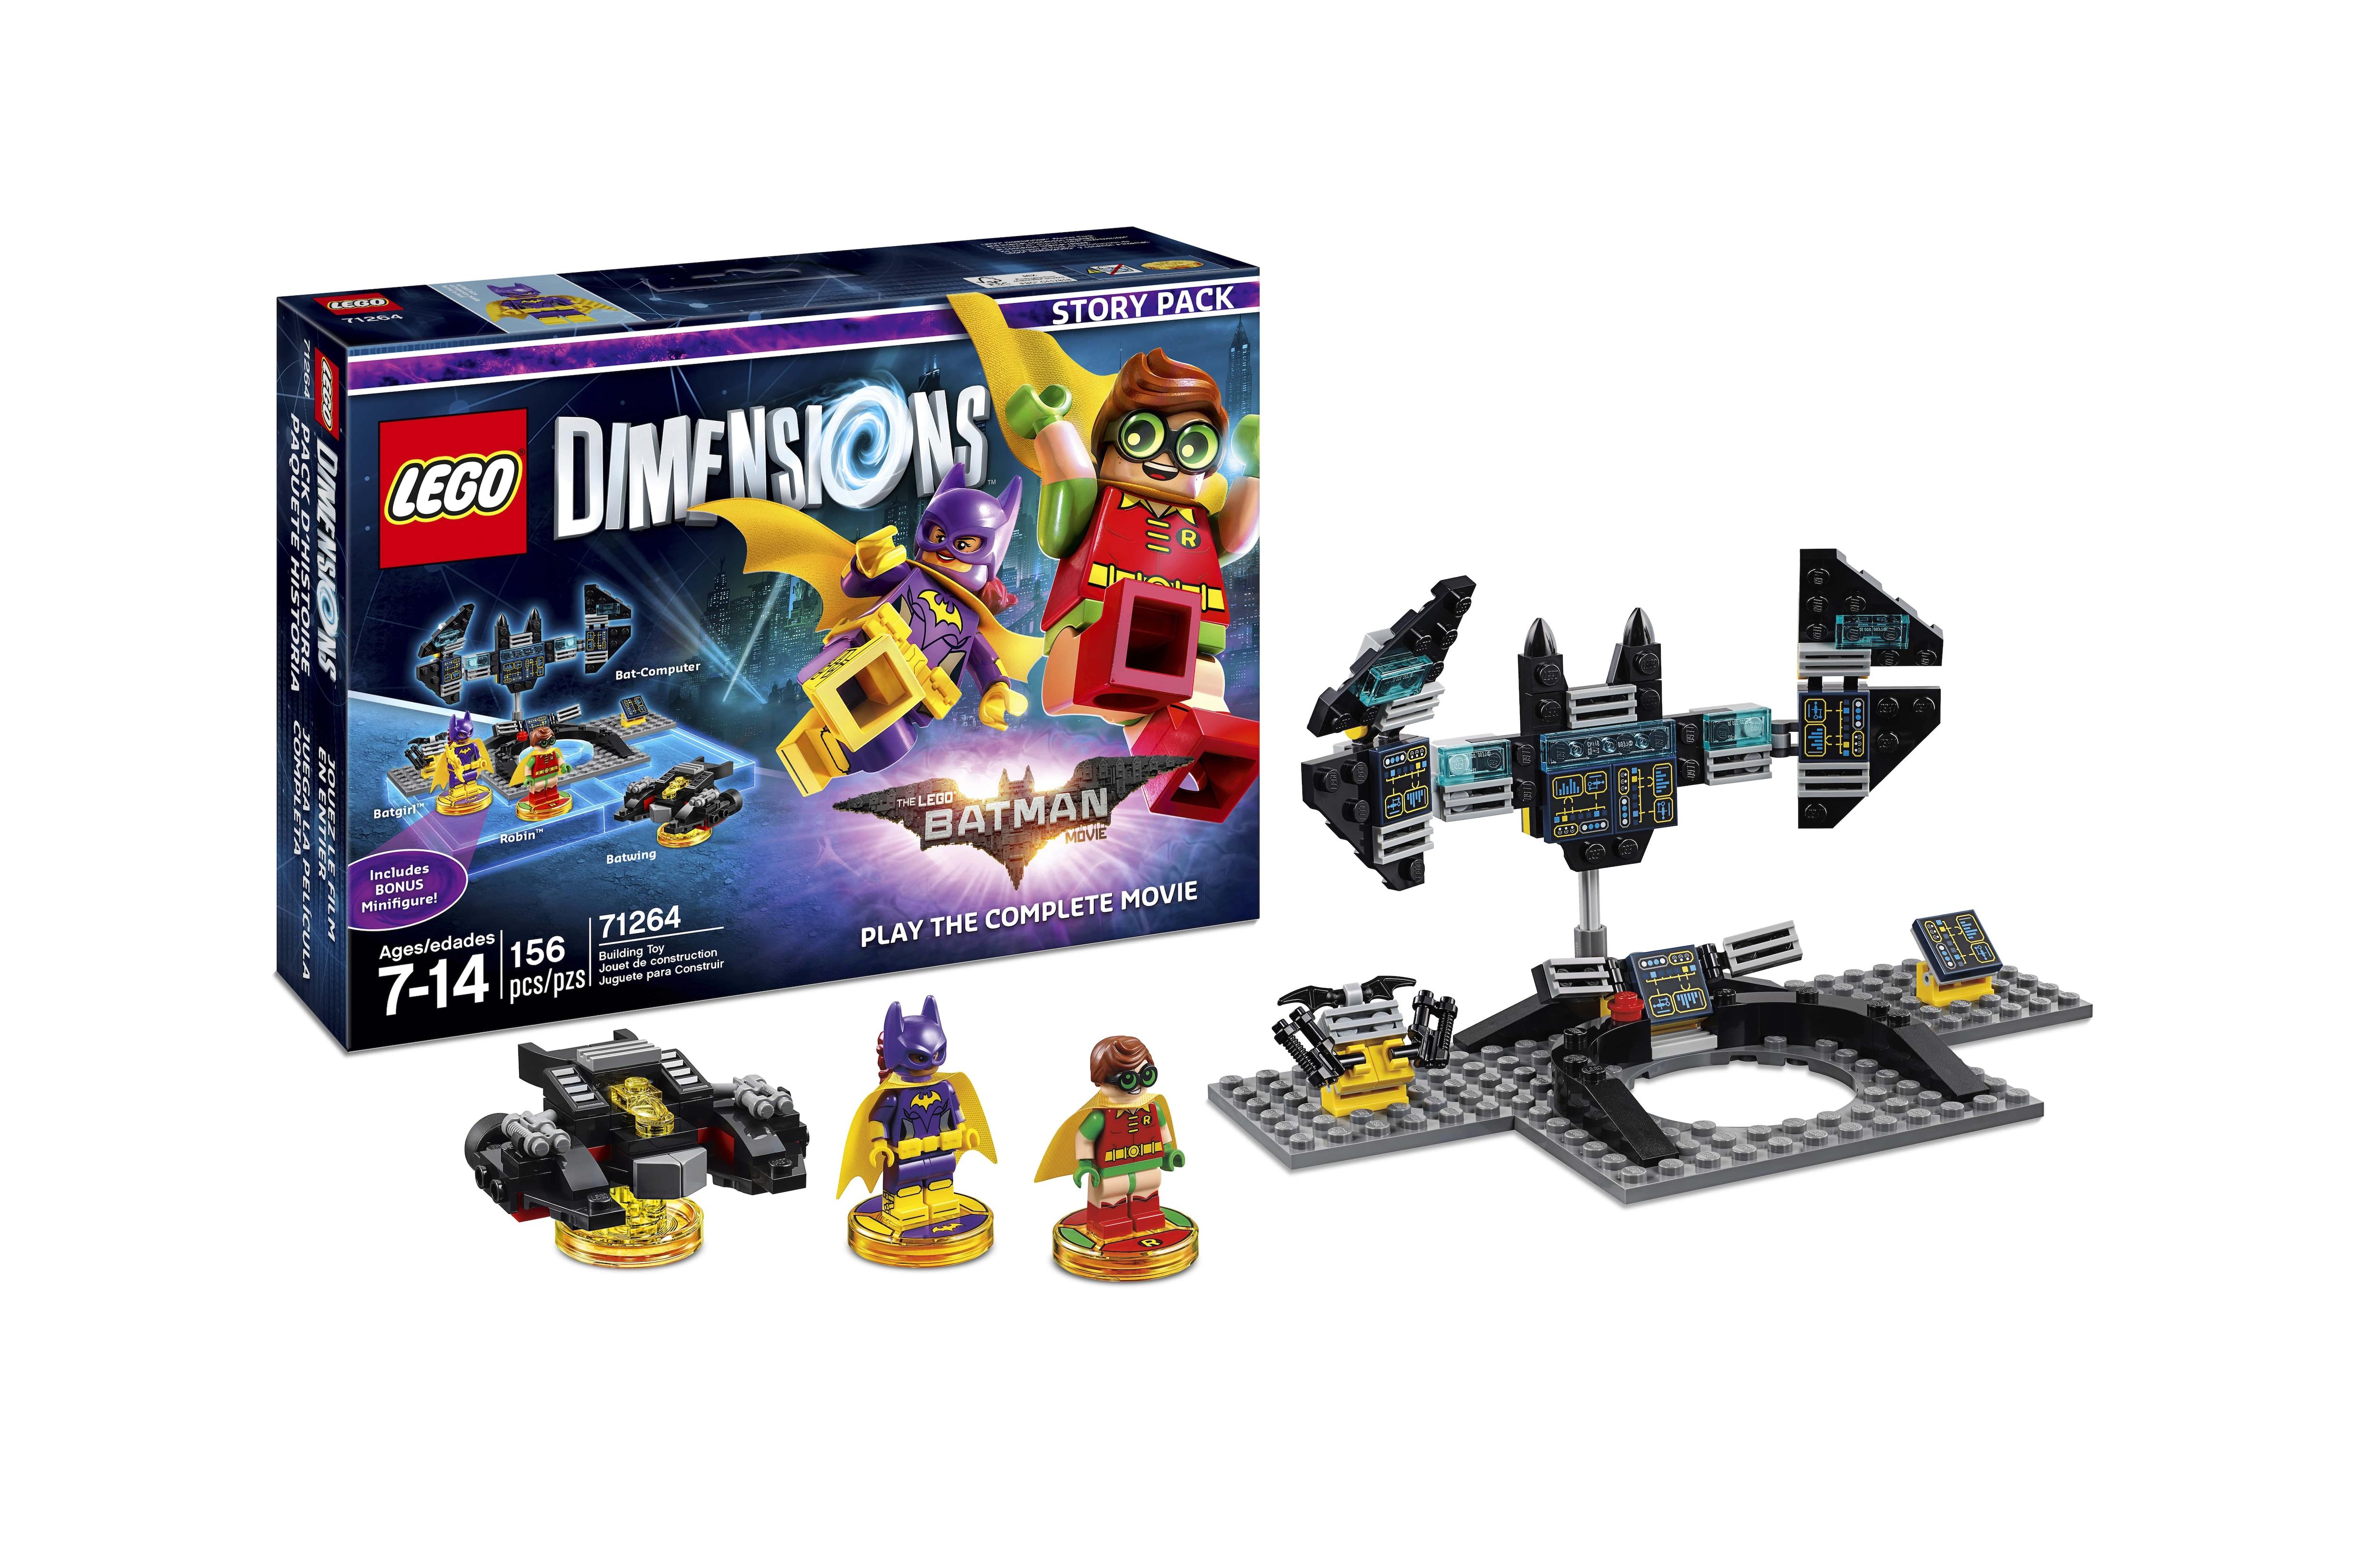 LEGO Dimensions Title